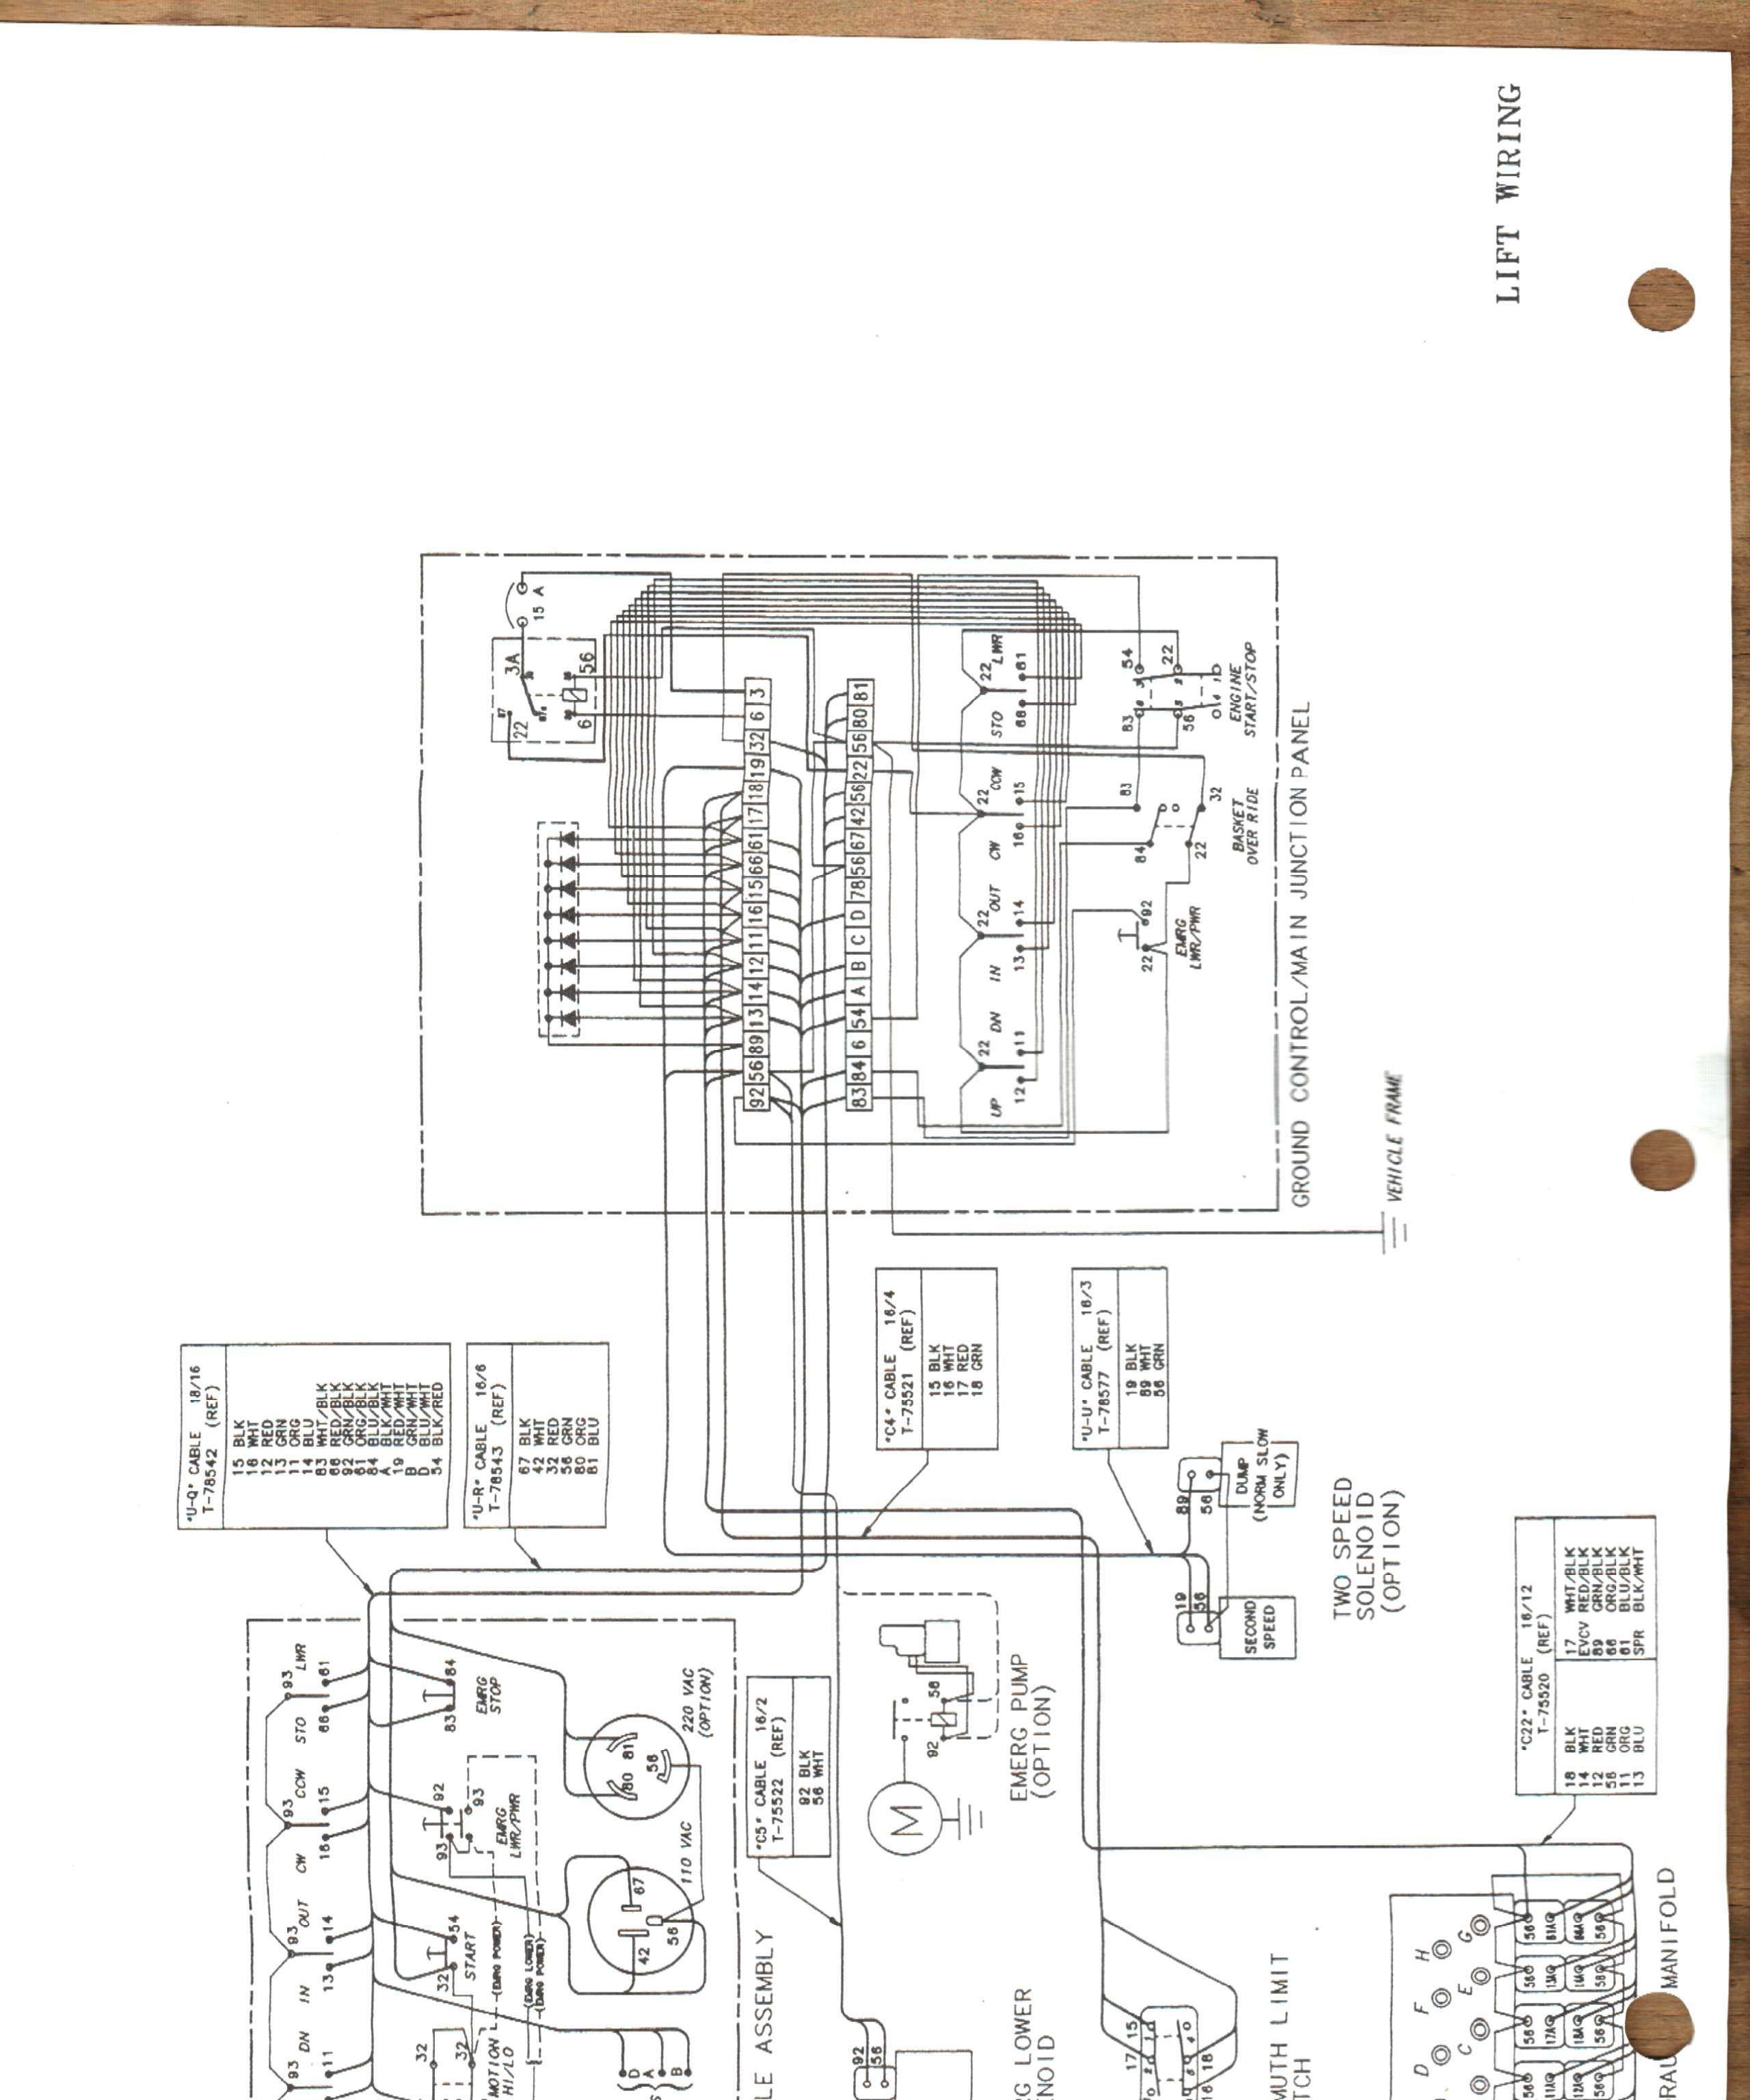 wiring diagram cars trucks wiring diagram cars trucks truck hornwiring diagram cars trucks wiring diagram cars [ 2560 x 3072 Pixel ]